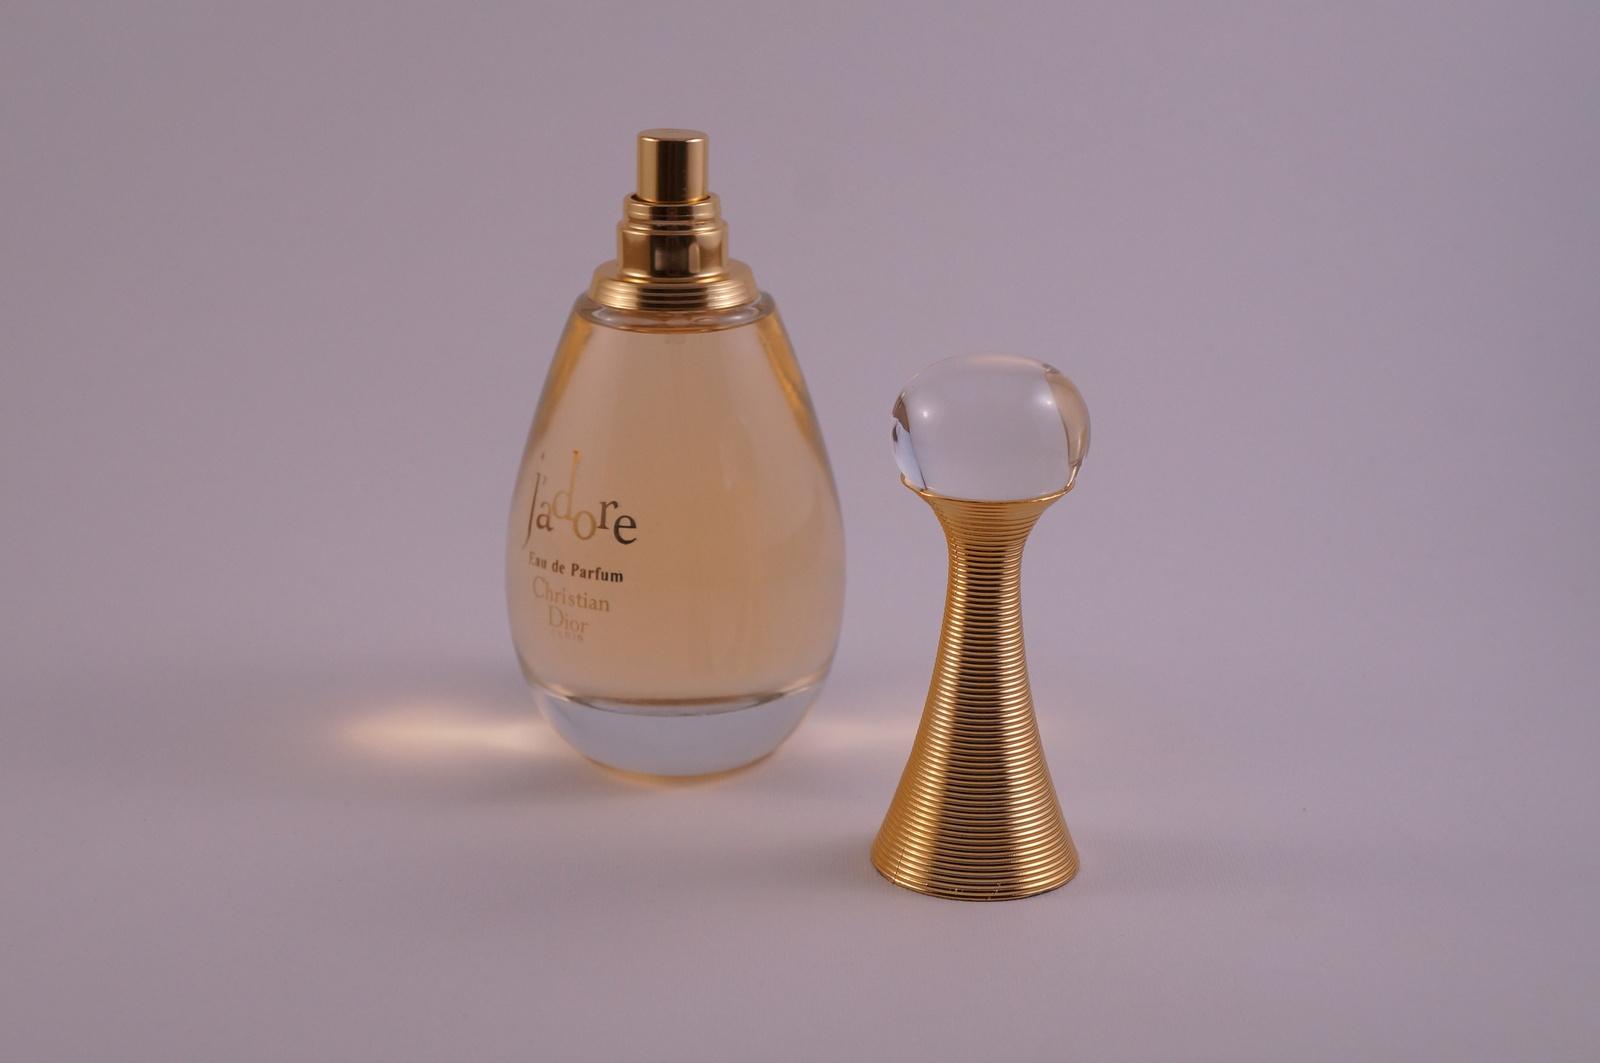 j 39 adore by christian dior eau de parfum spray for women fragrance 3 4 oz 100ml women. Black Bedroom Furniture Sets. Home Design Ideas